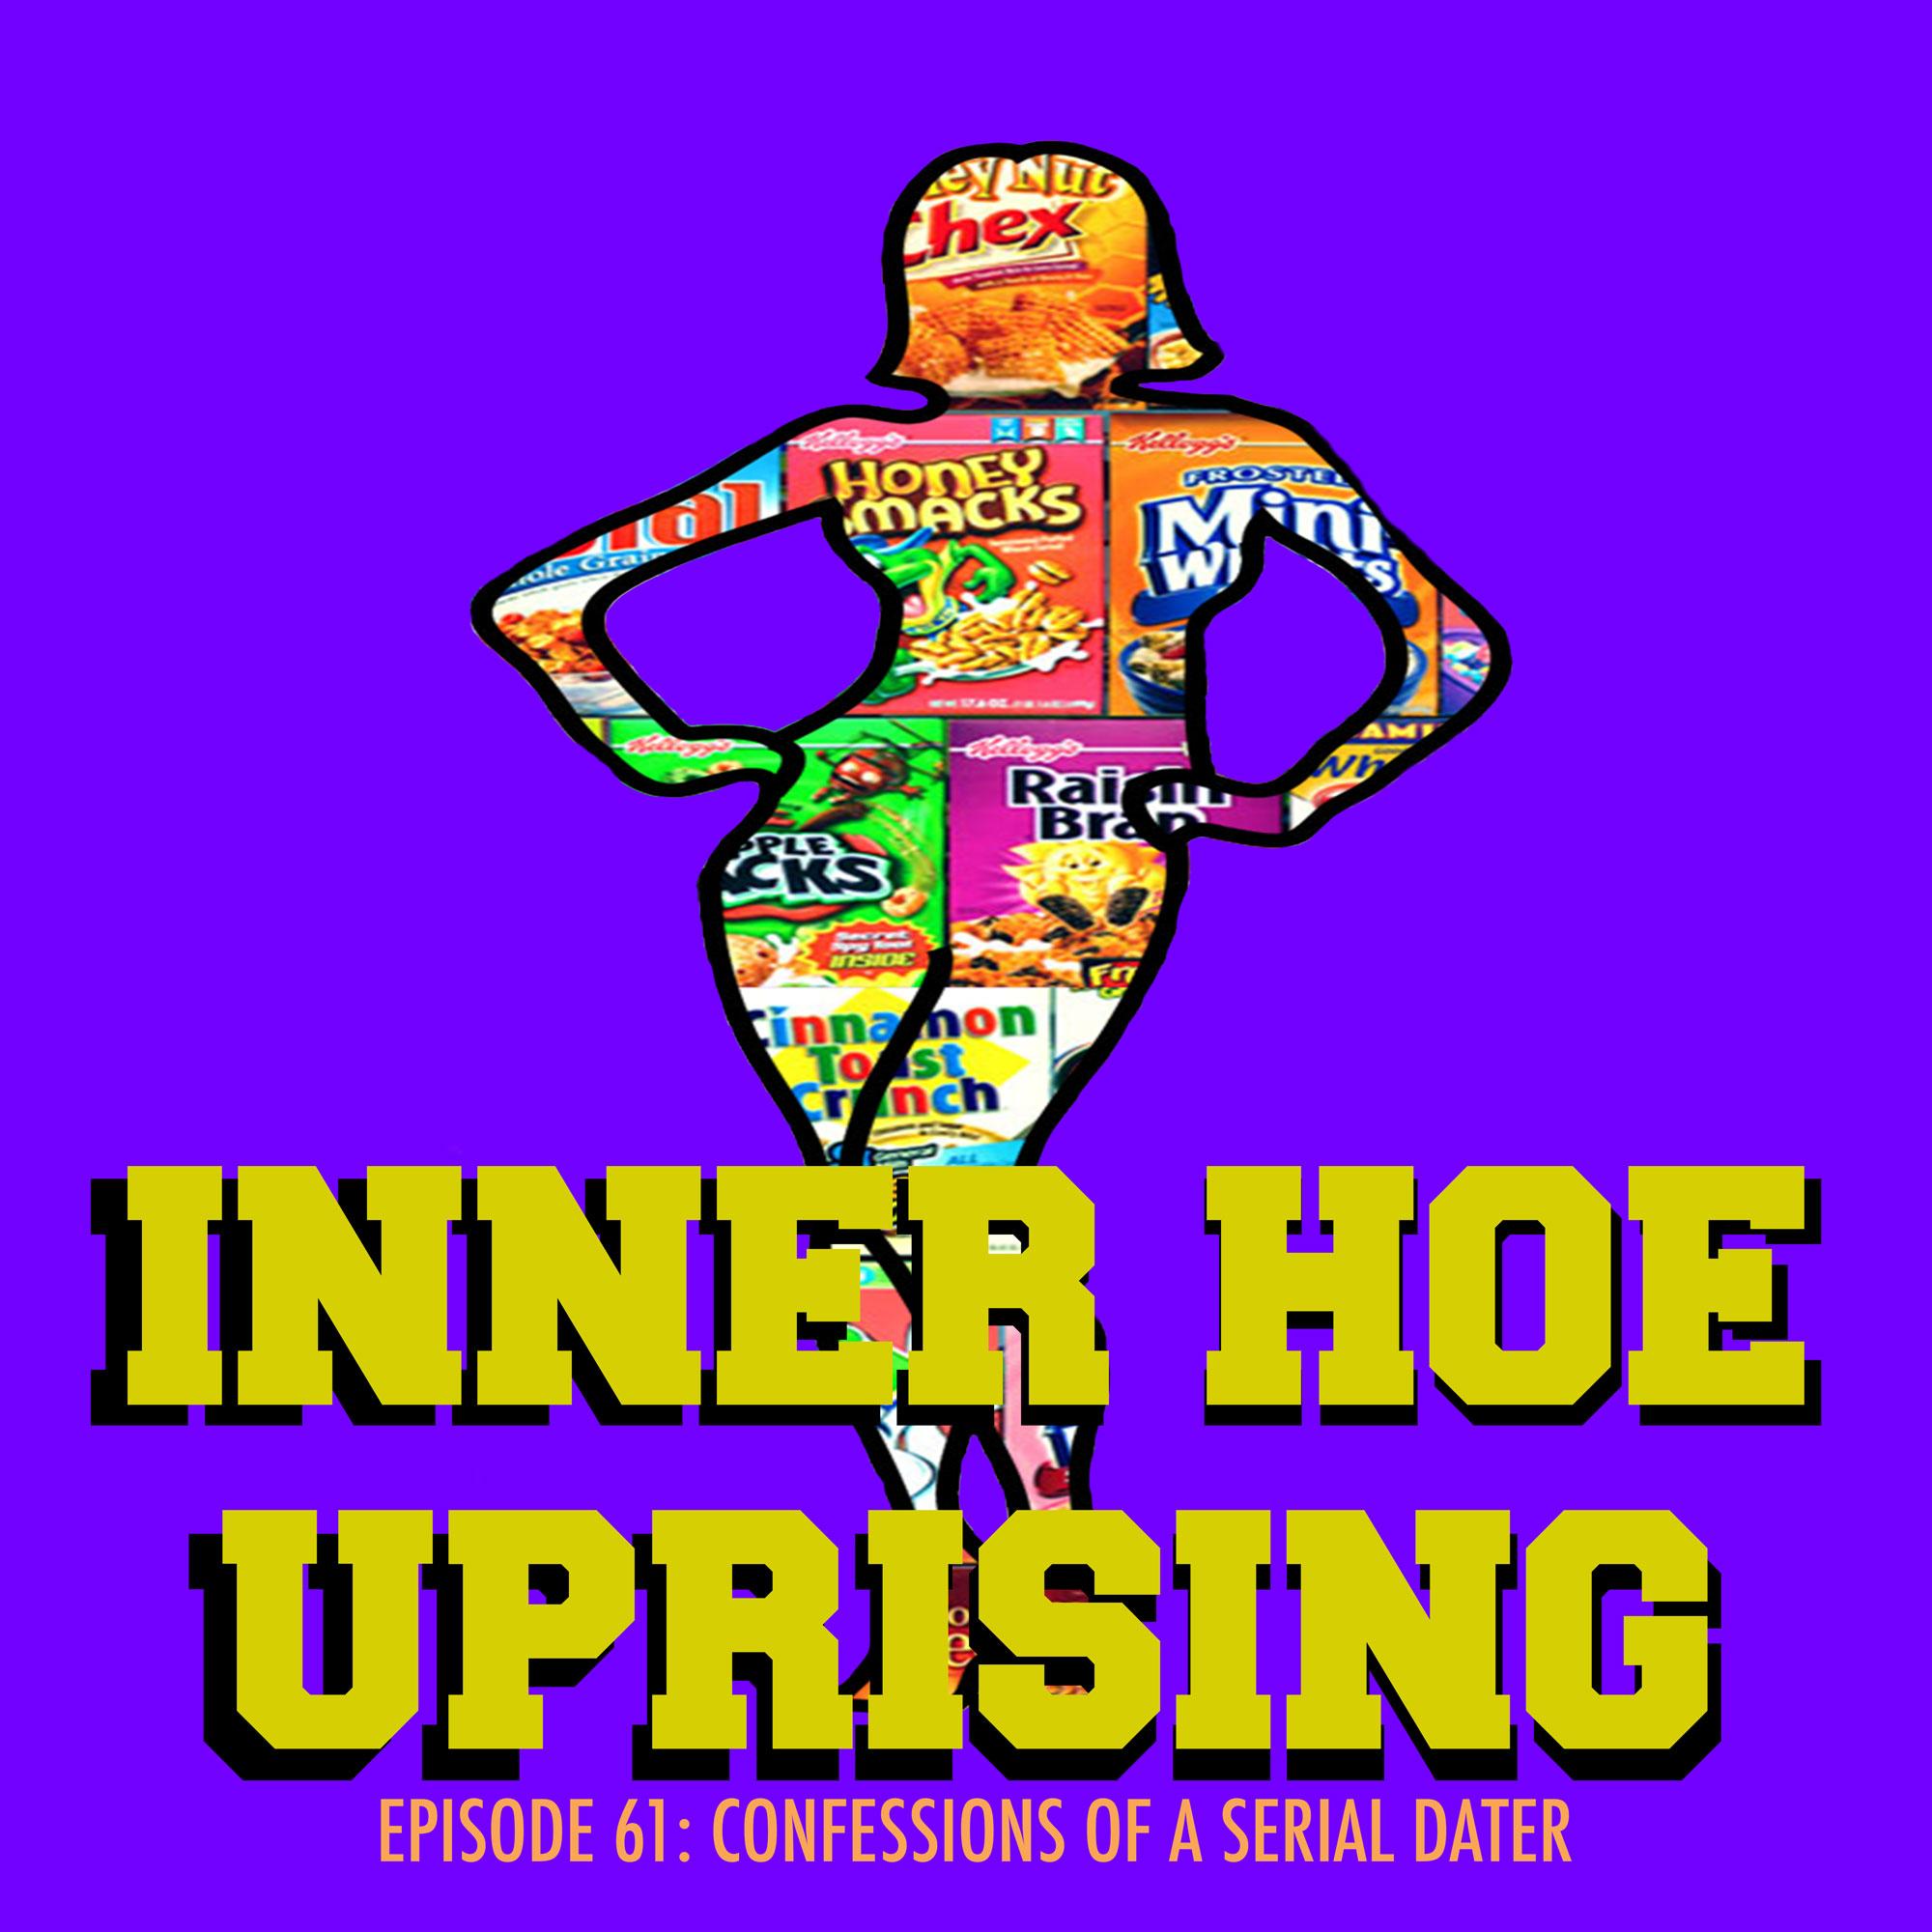 Inner Hoe Uprising, Serial Dating Cereal Dater